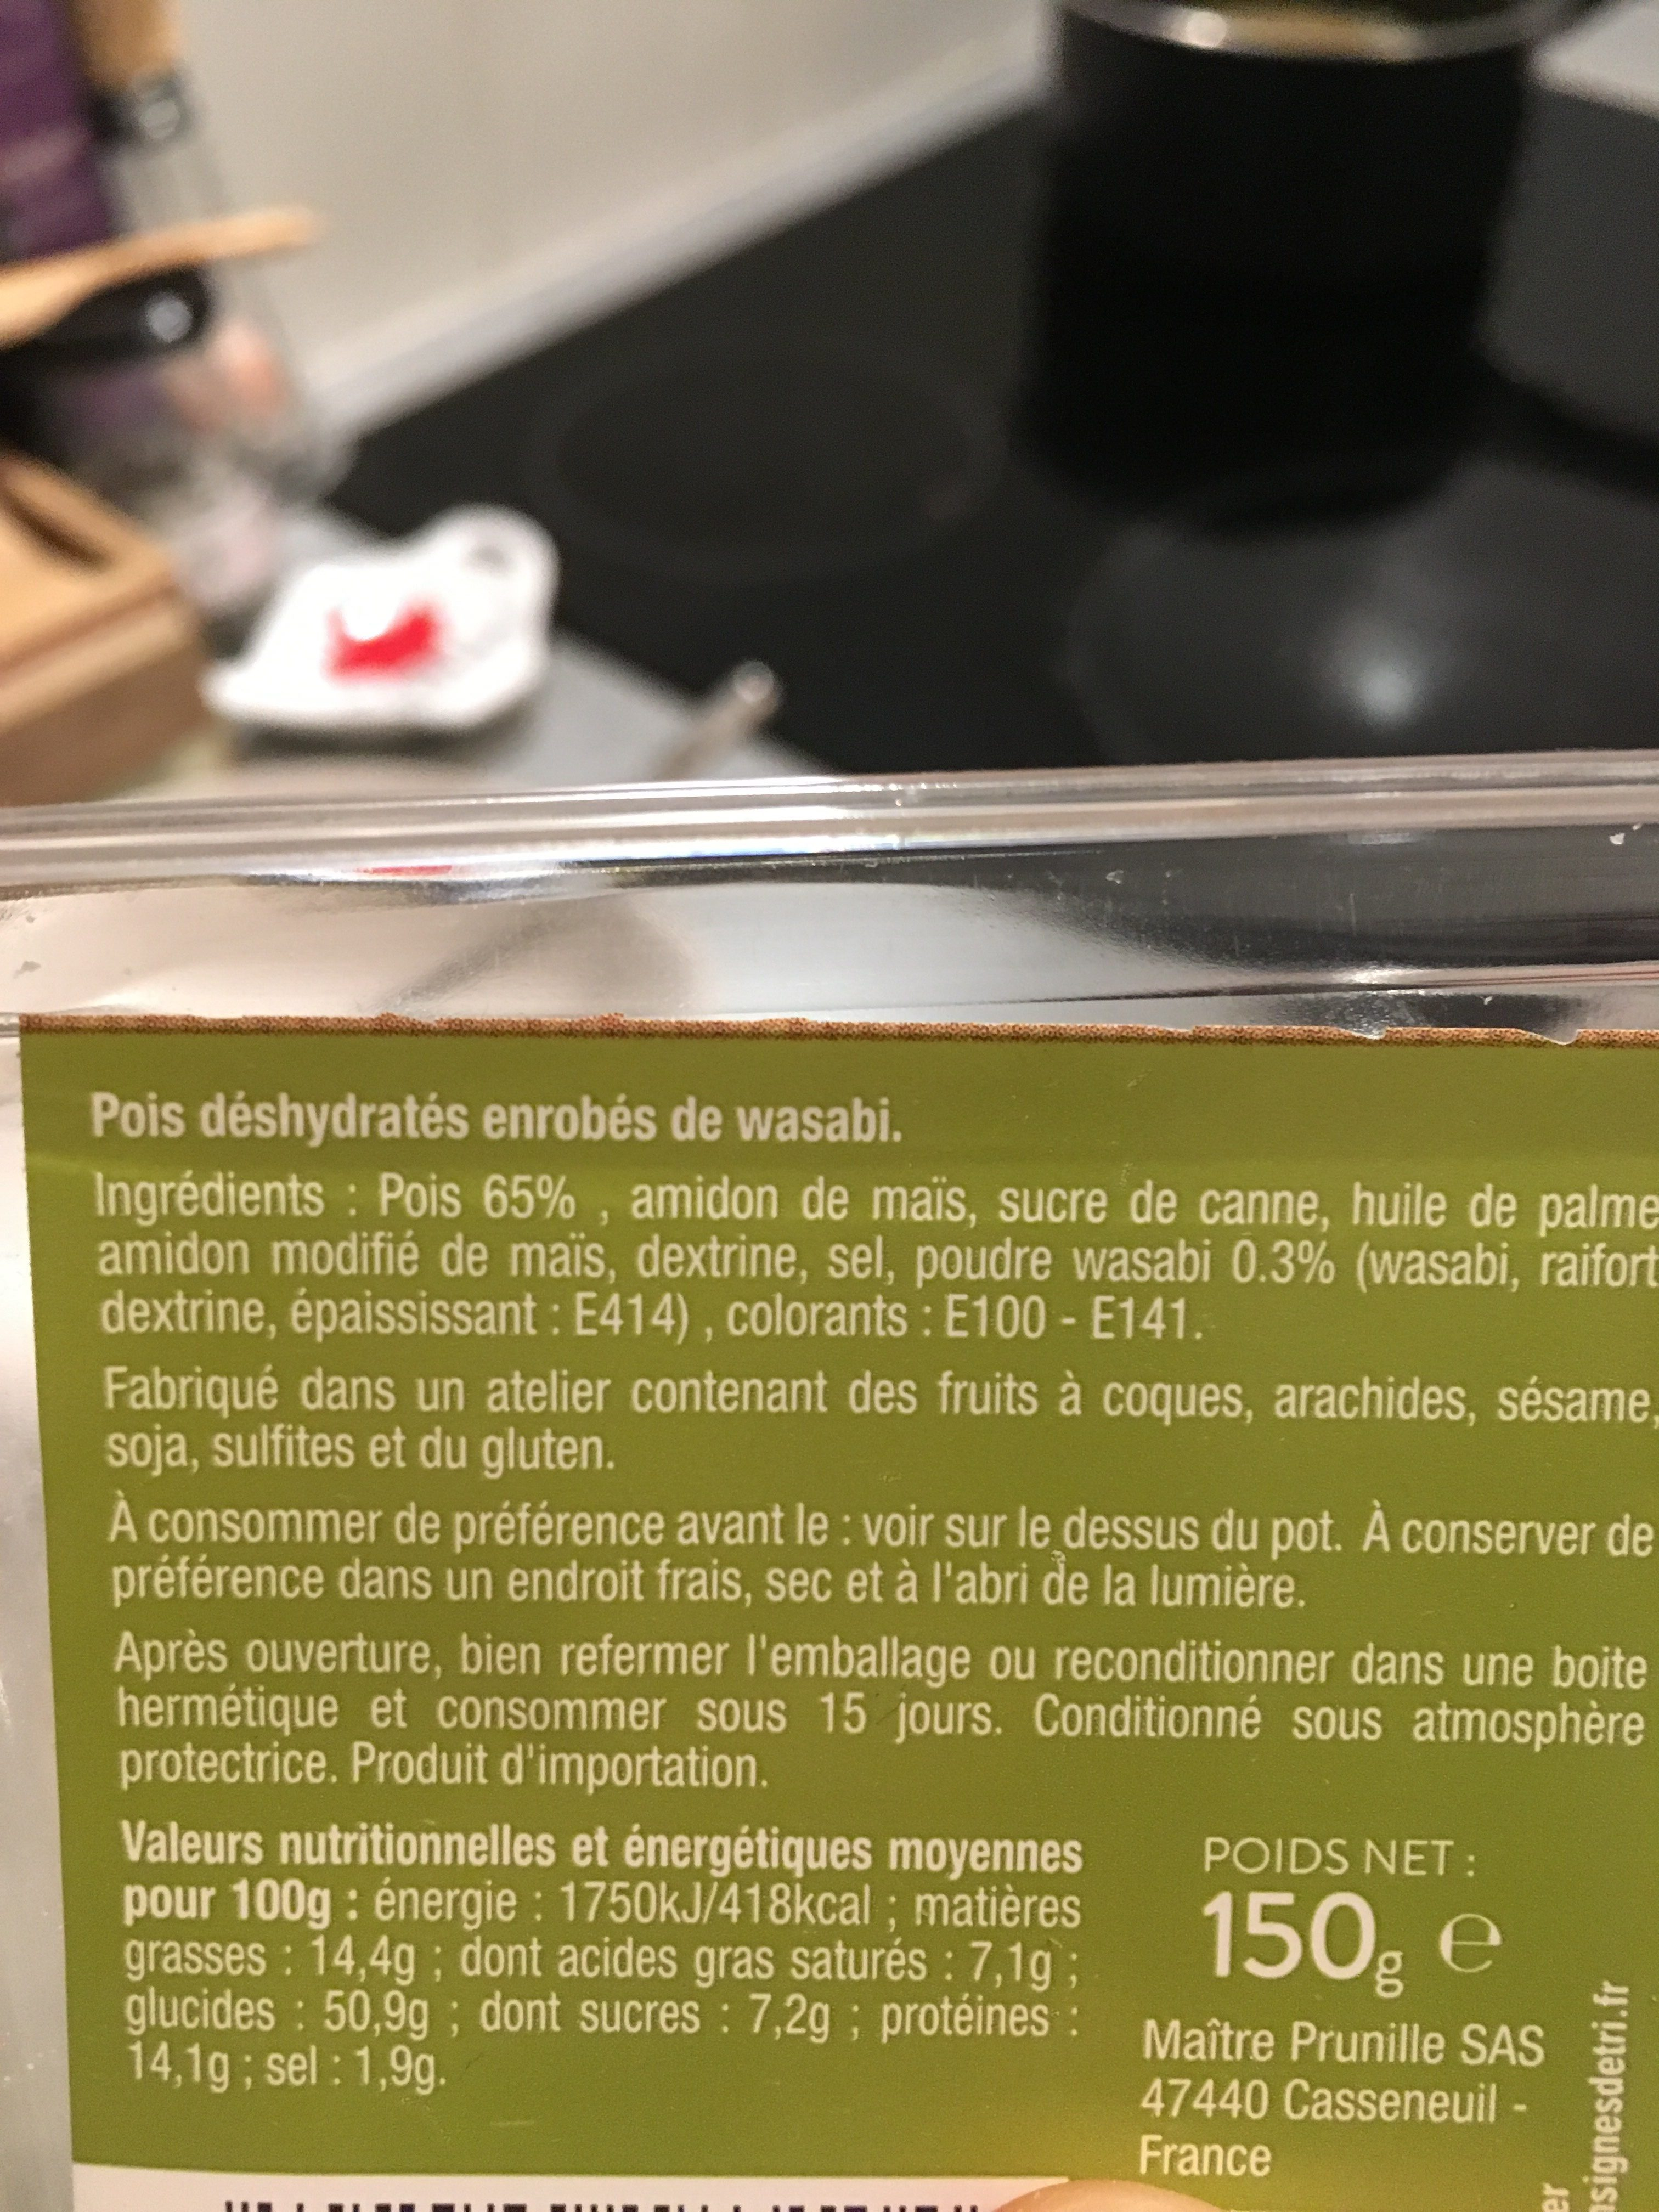 Pois au wasabi - Ingredients - fr